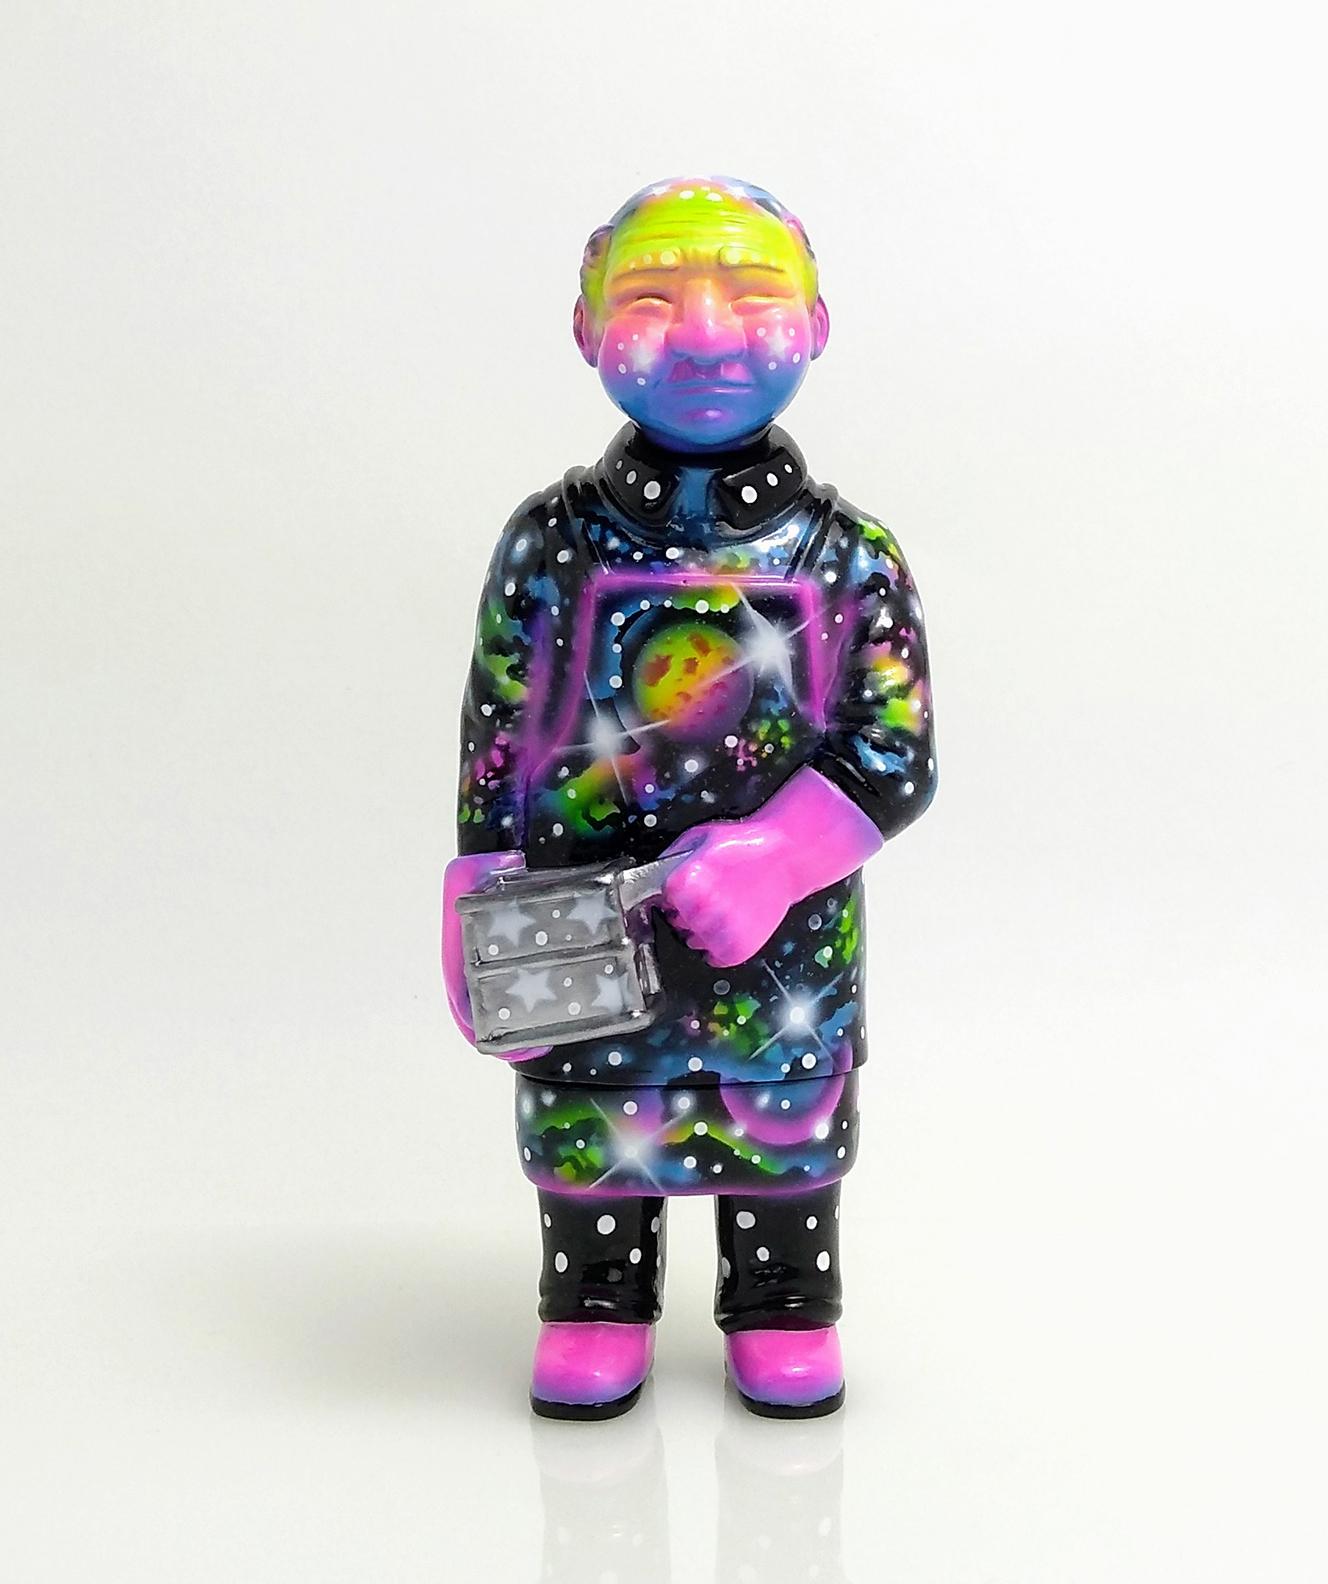 Sofubi-man Custom Show Zukaty Galactic Space style UV glows